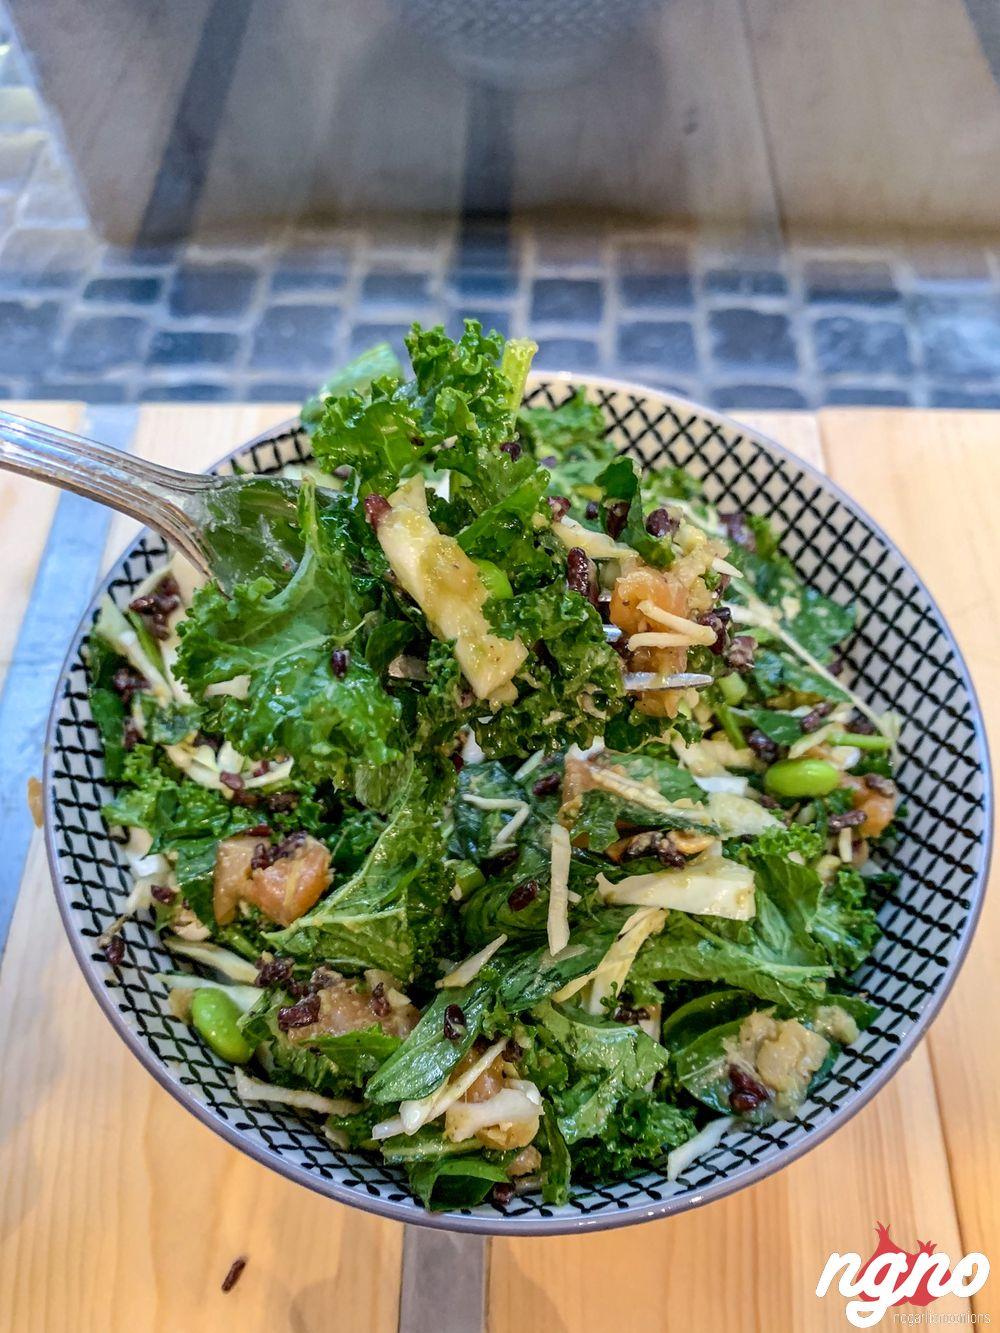 salata-eatery-beirut-nogarlicnoonions-62019-02-22-12-49-26